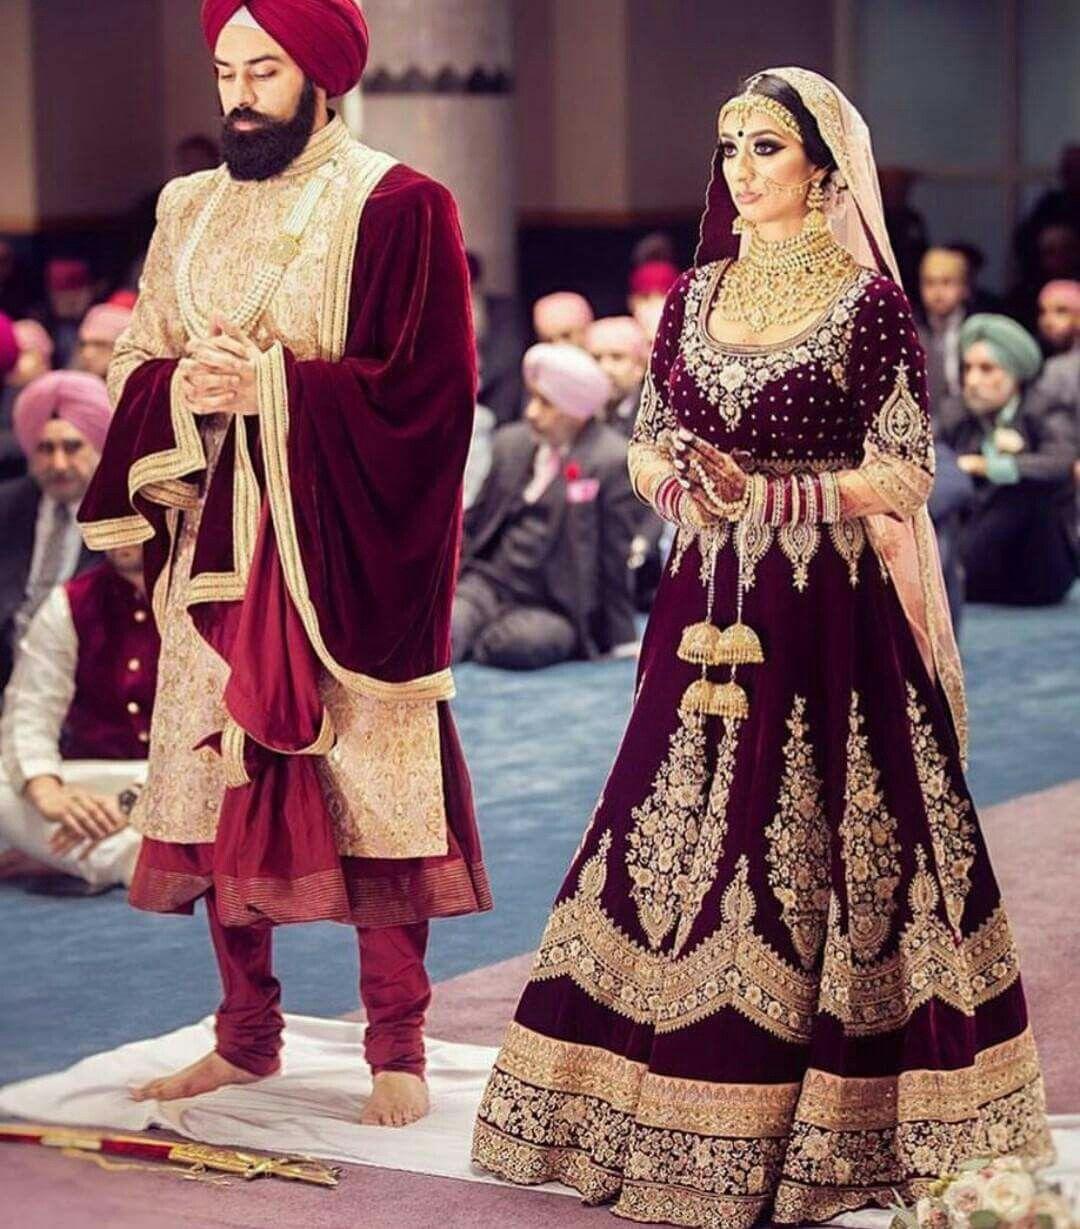 Stunning wedding dress | couples | Pinterest | Brautkleid